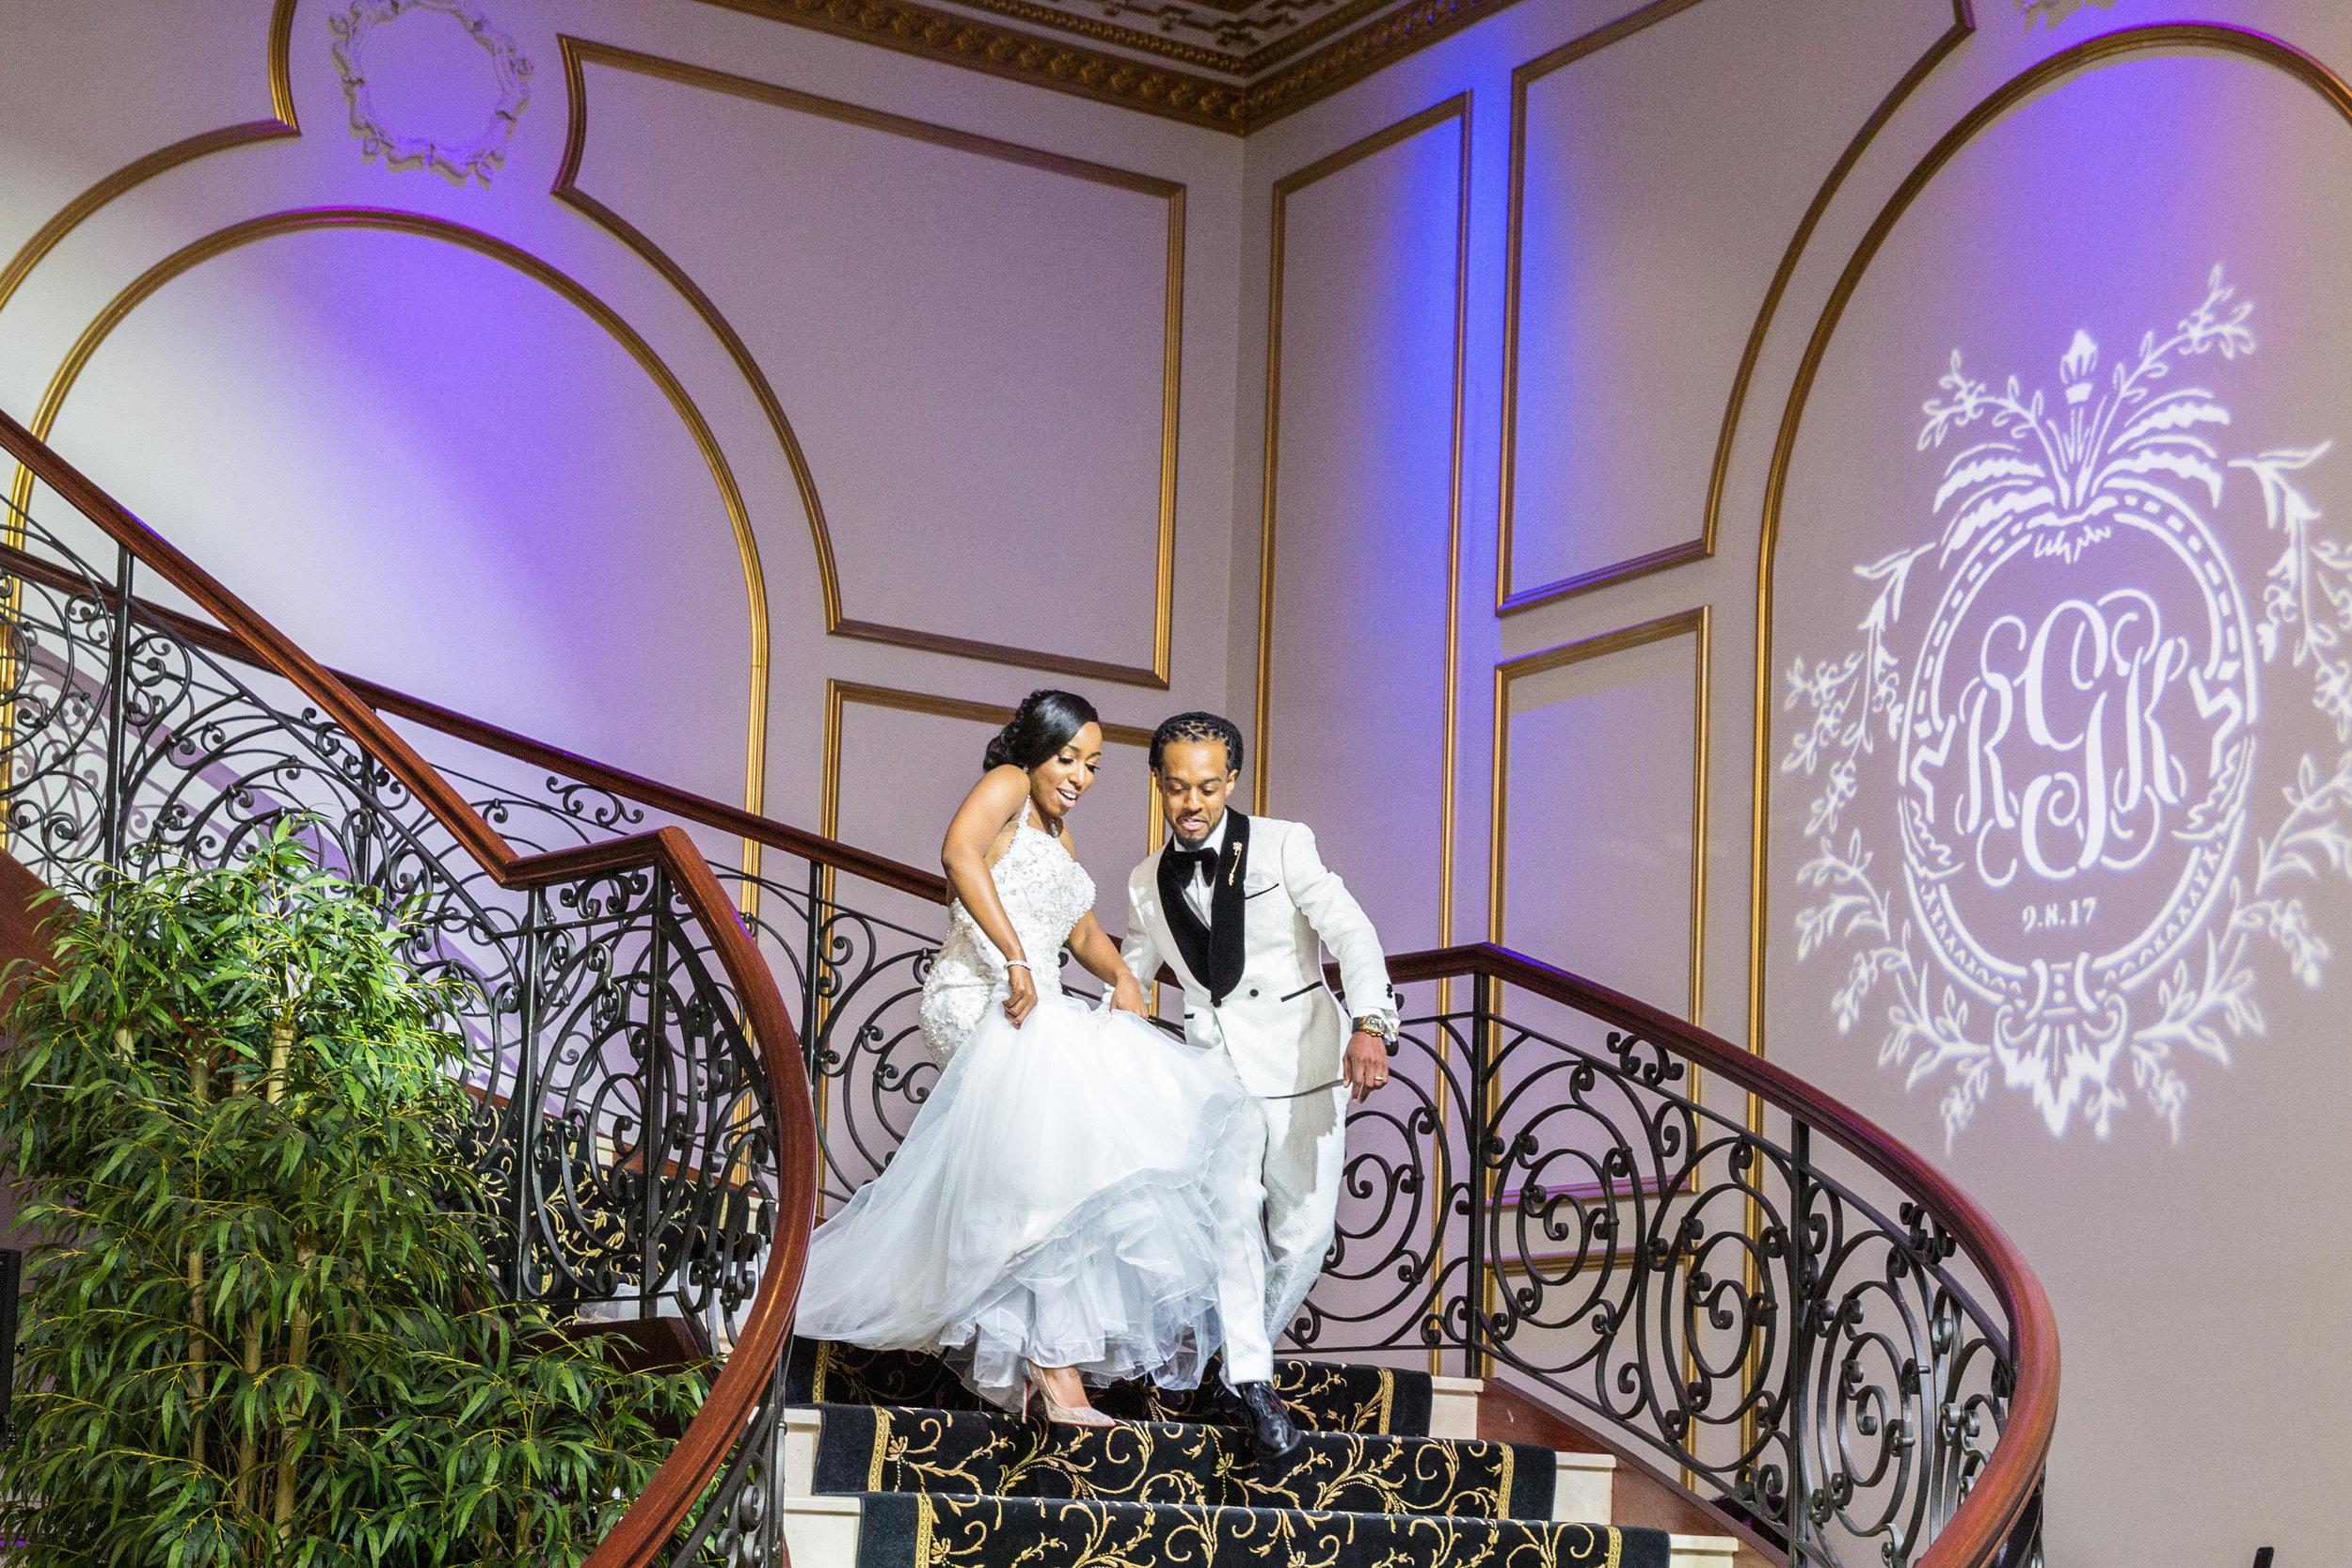 victorious-events-nyc-025-romie-kamali-tides-estate-wedding-nana-annan.jpg